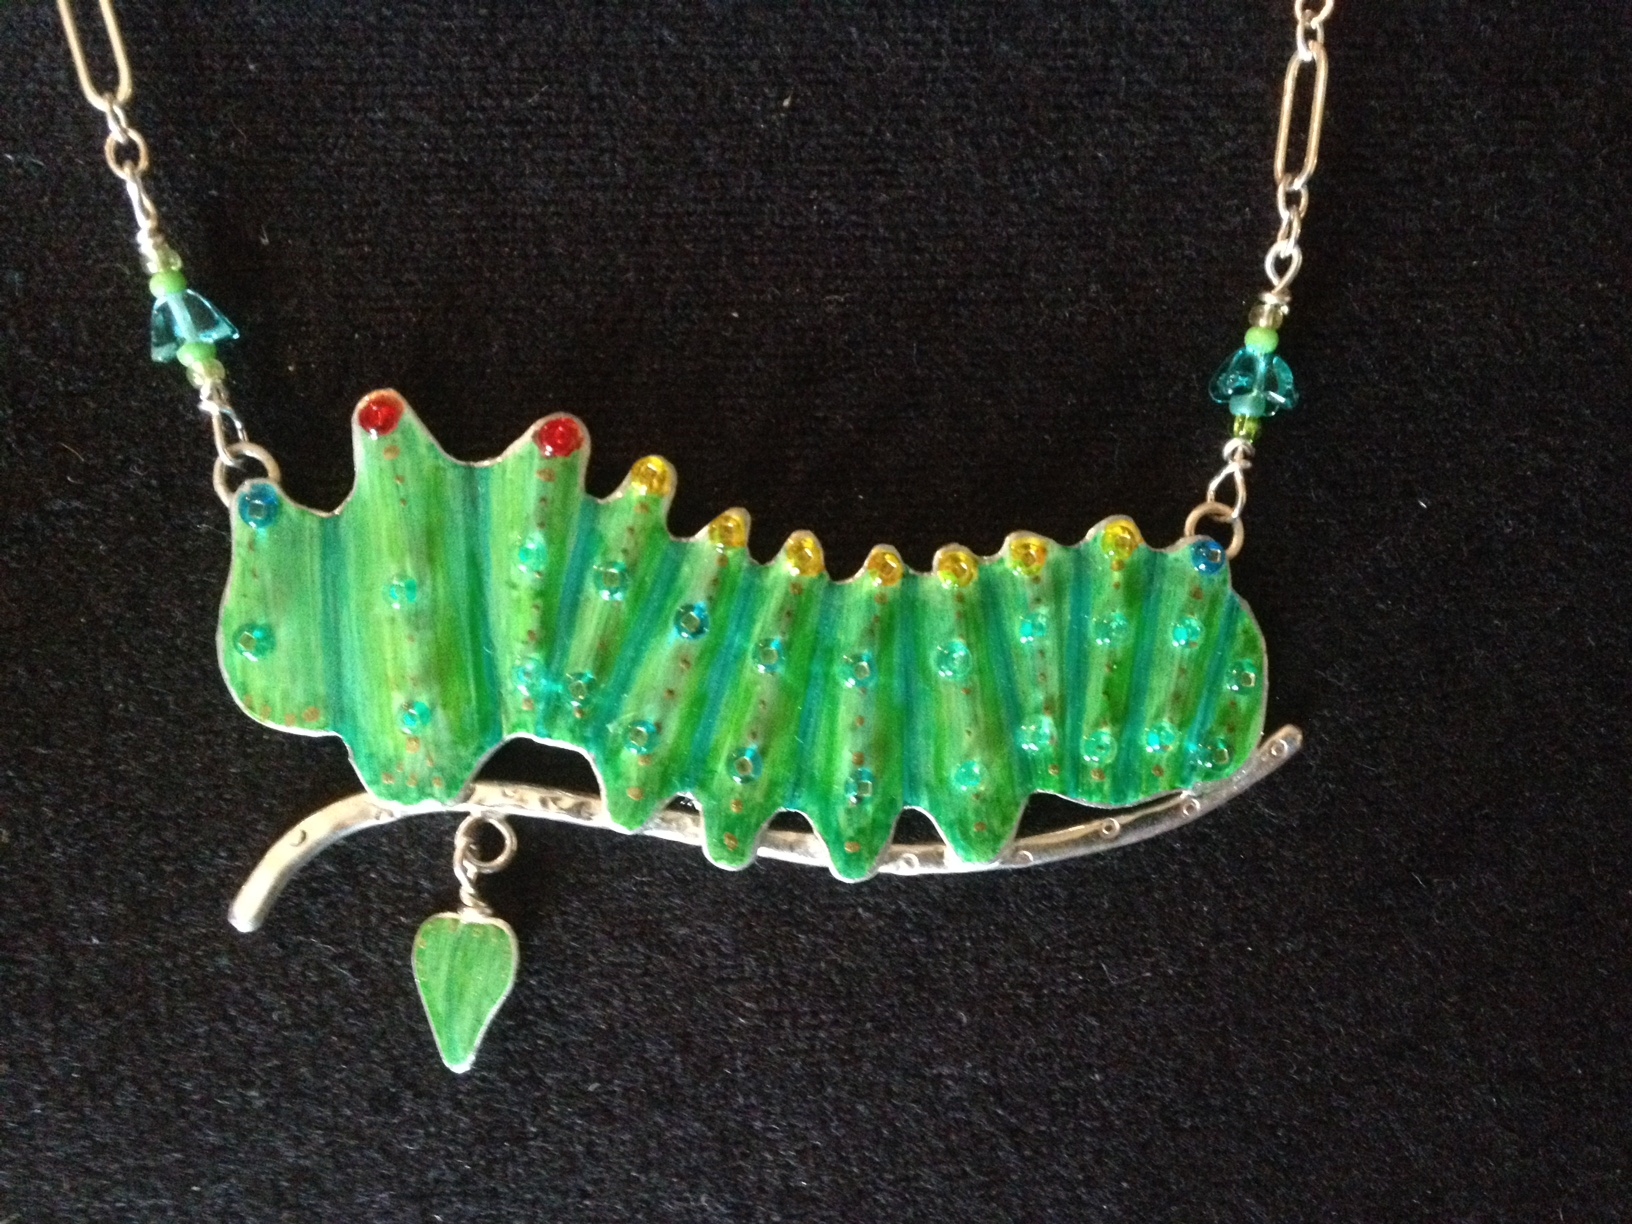 Lucy Golden Caterpillar necklace